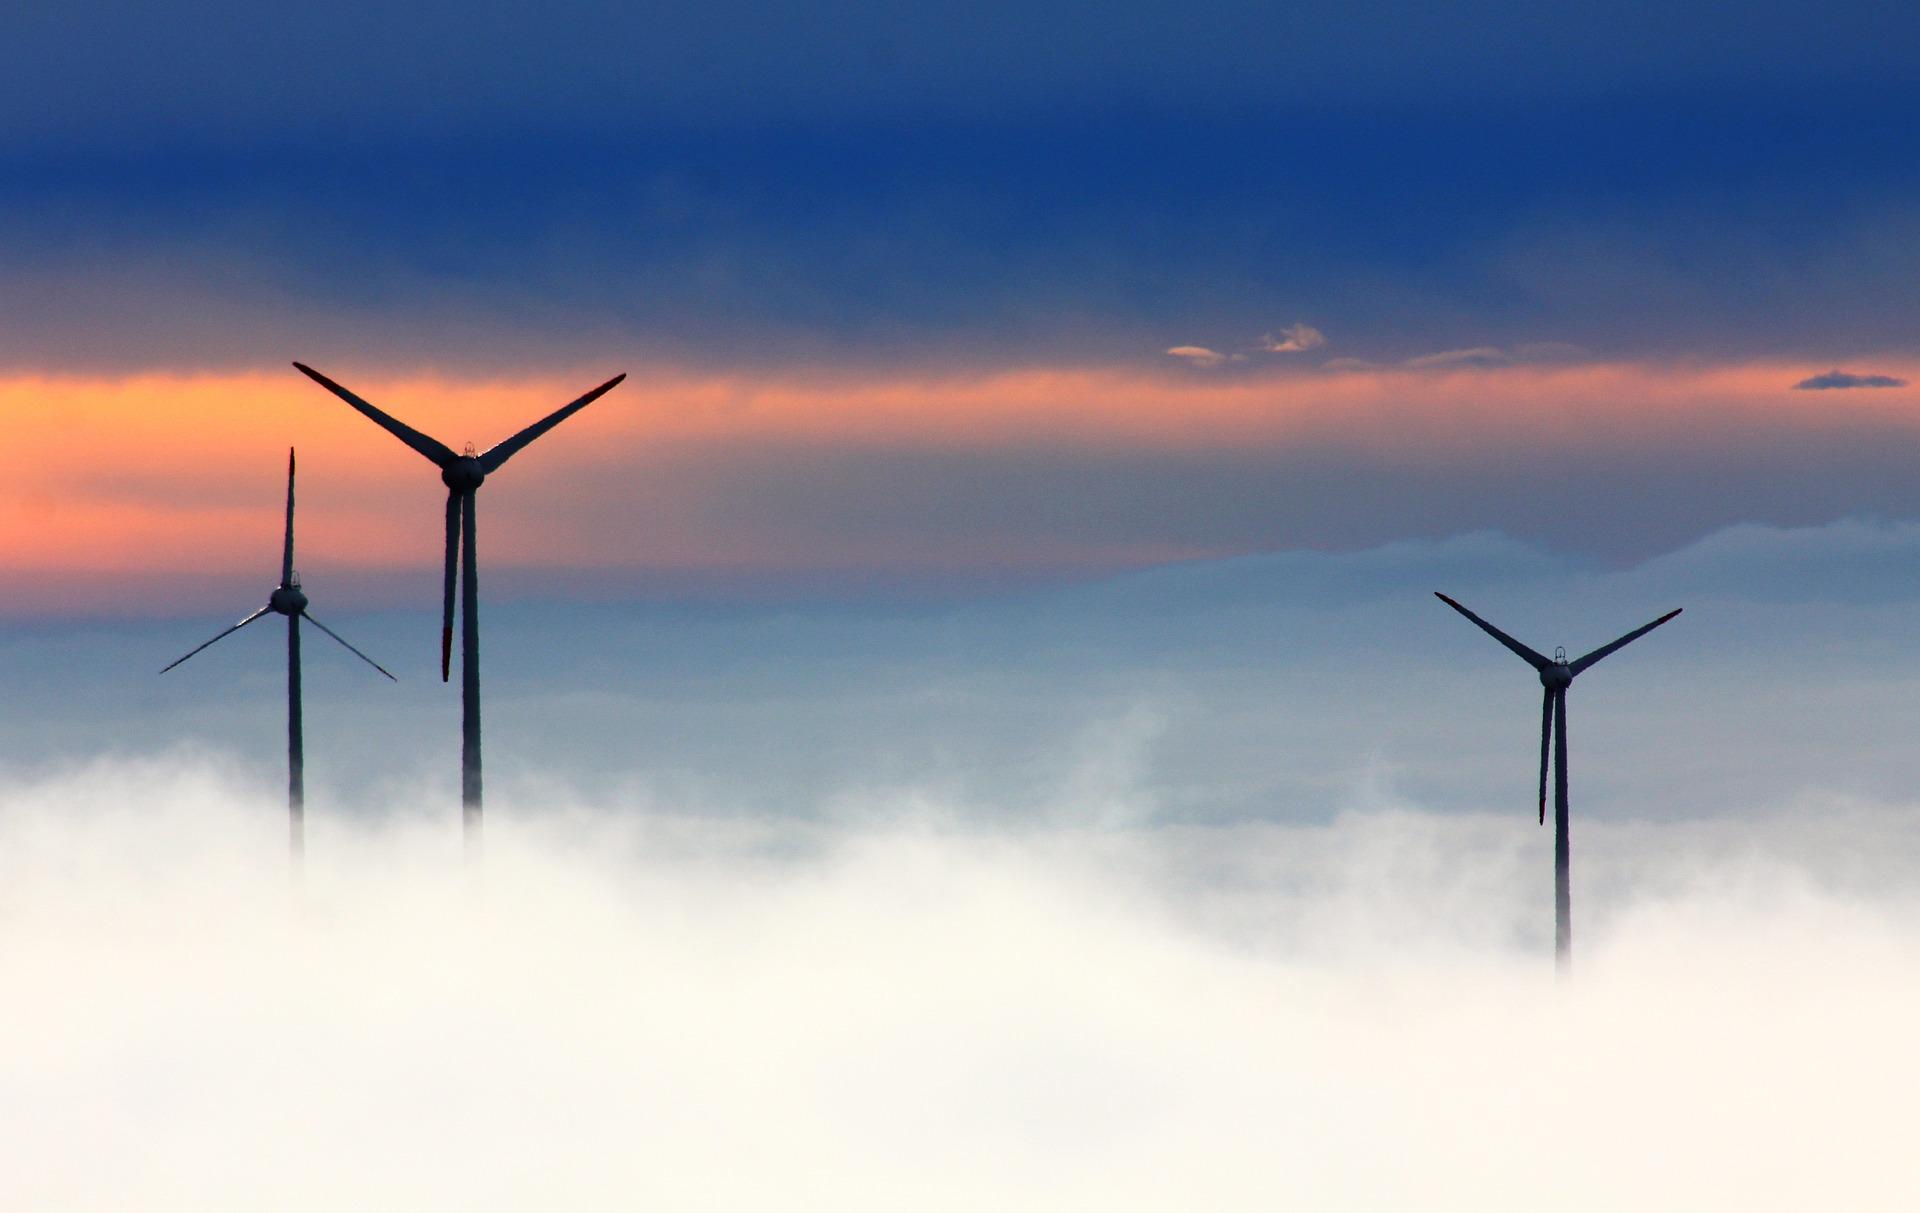 vietnam eolien en mer transition energetique - L'Energeek